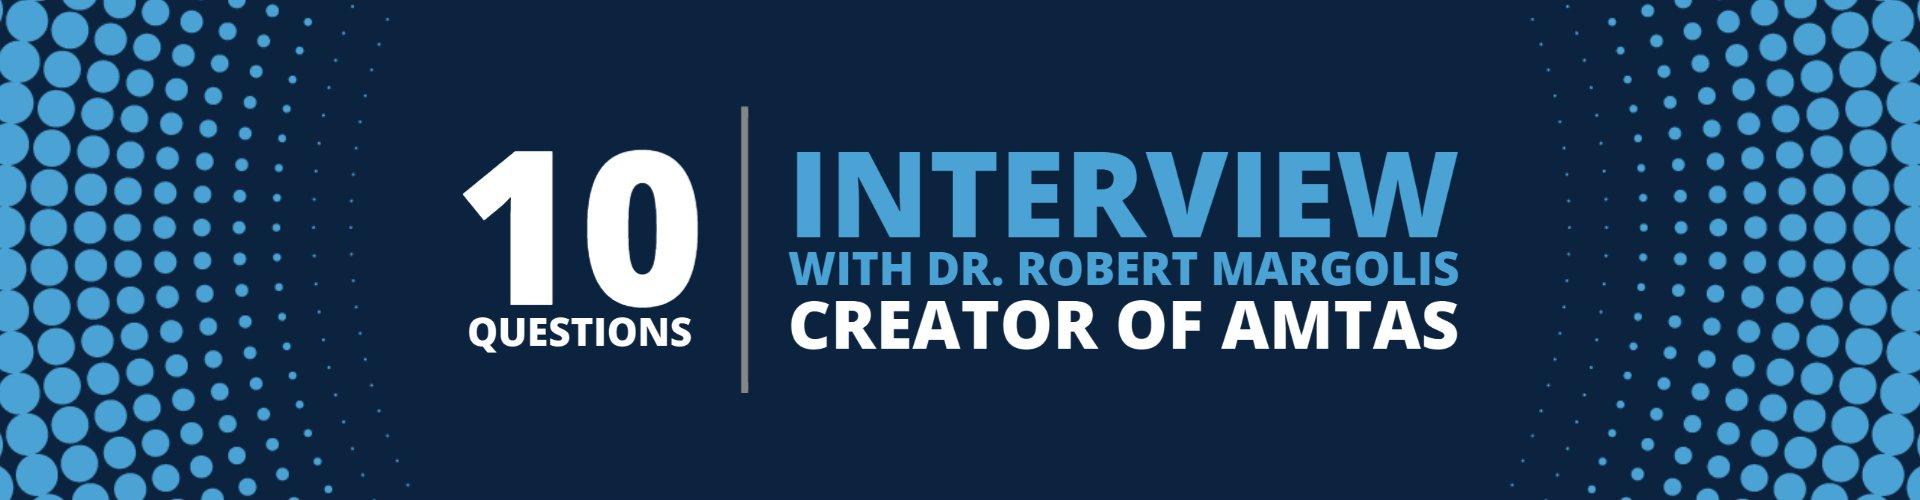 amtas-interview